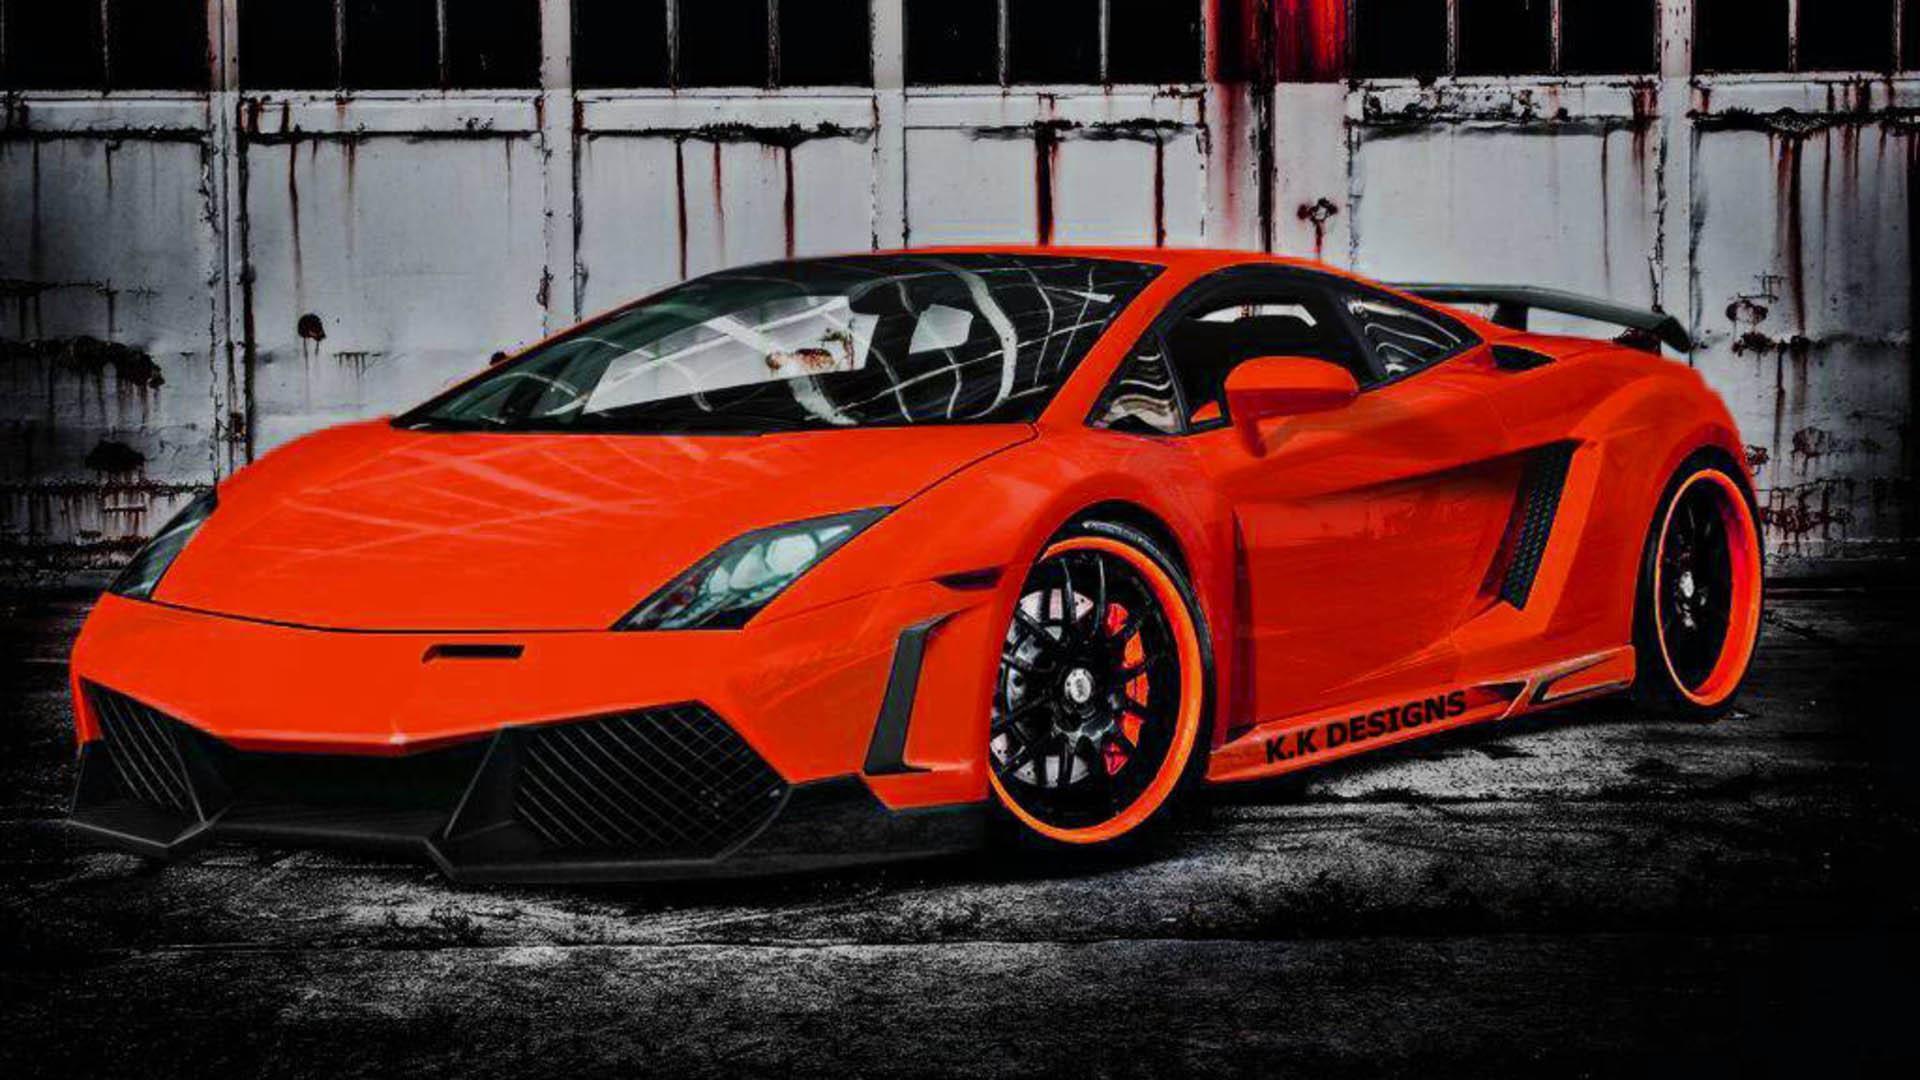 Lamborghini Gallardo Wallpapers - Wallpaper Cave Red Lamborghini Gallardo Wallpaper